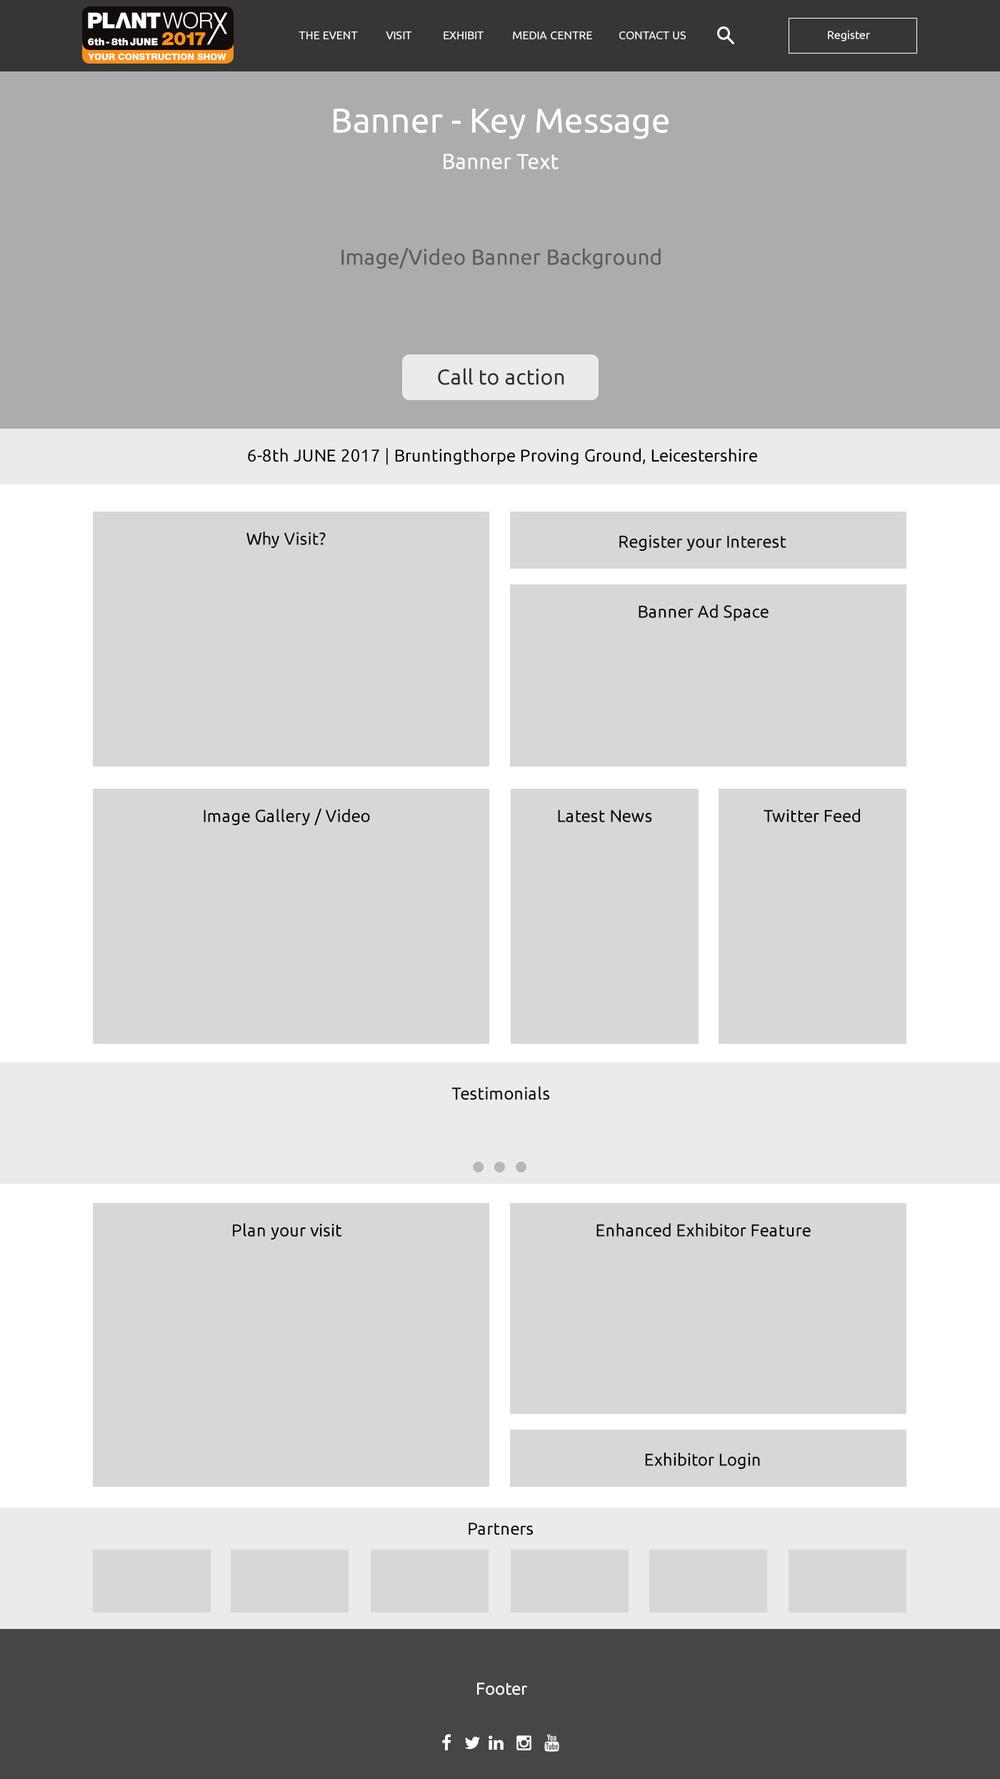 Plantworx-Home-Desktop.jpg